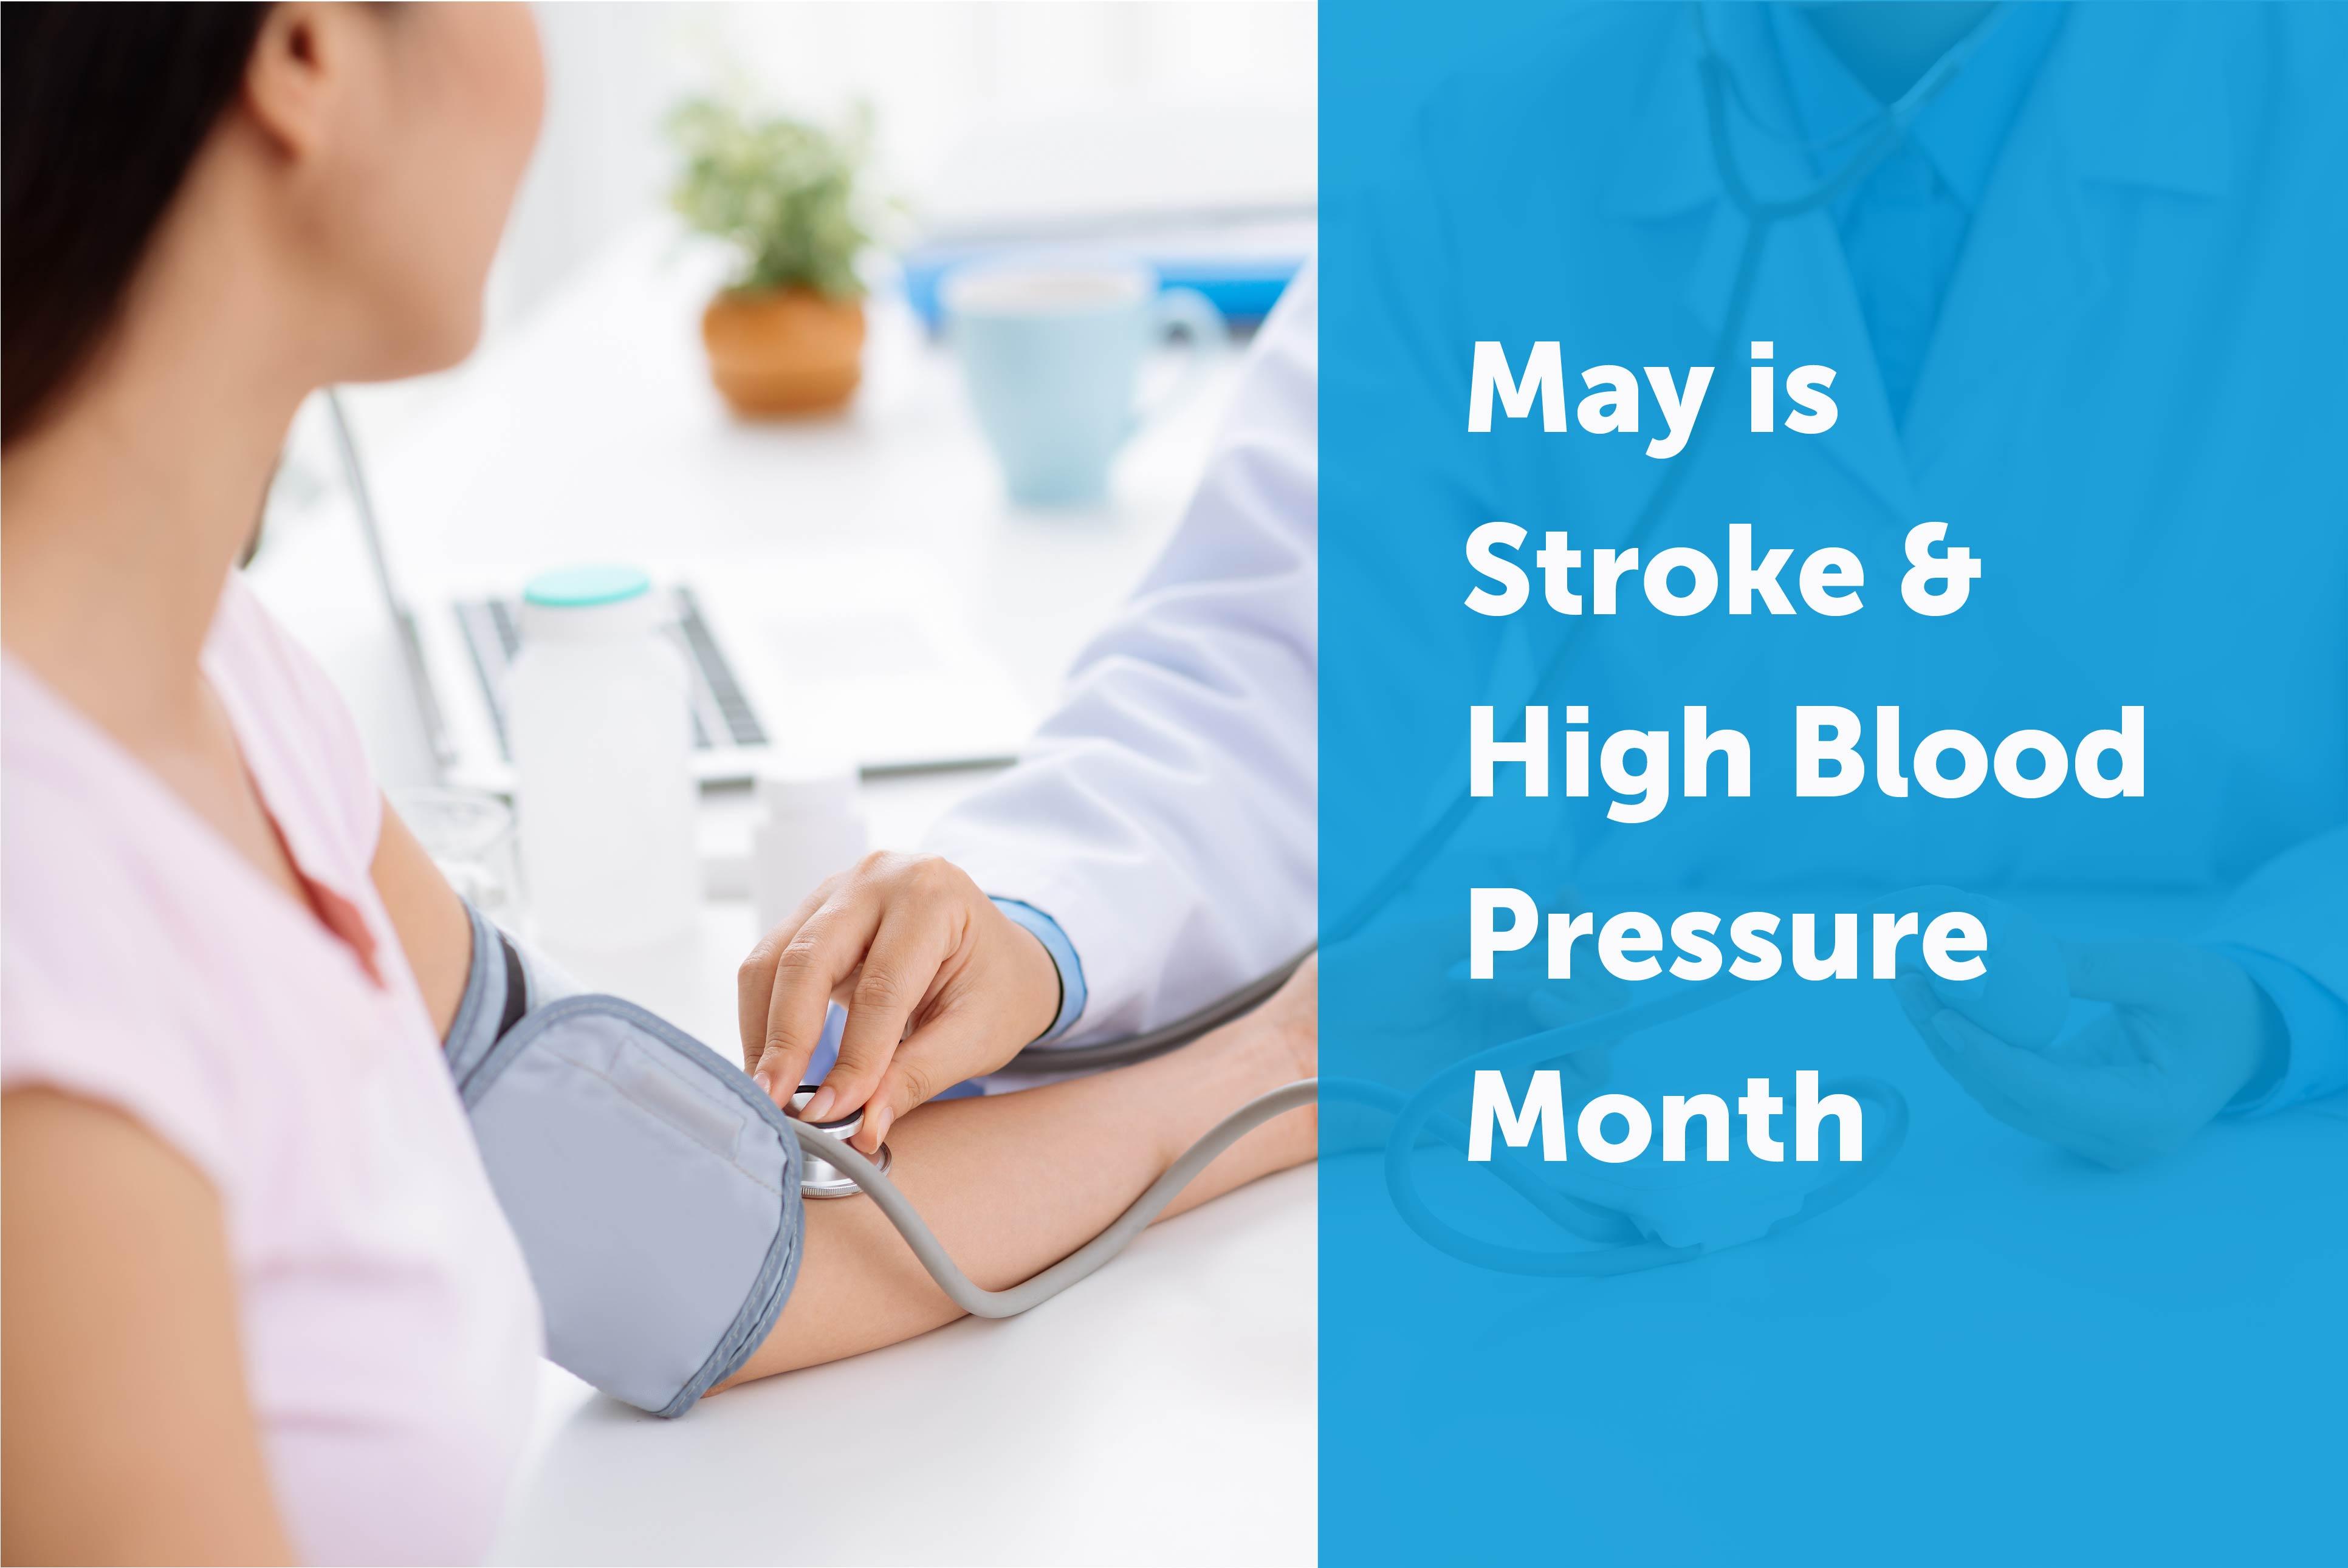 Stroke & High Blood Pressure Month